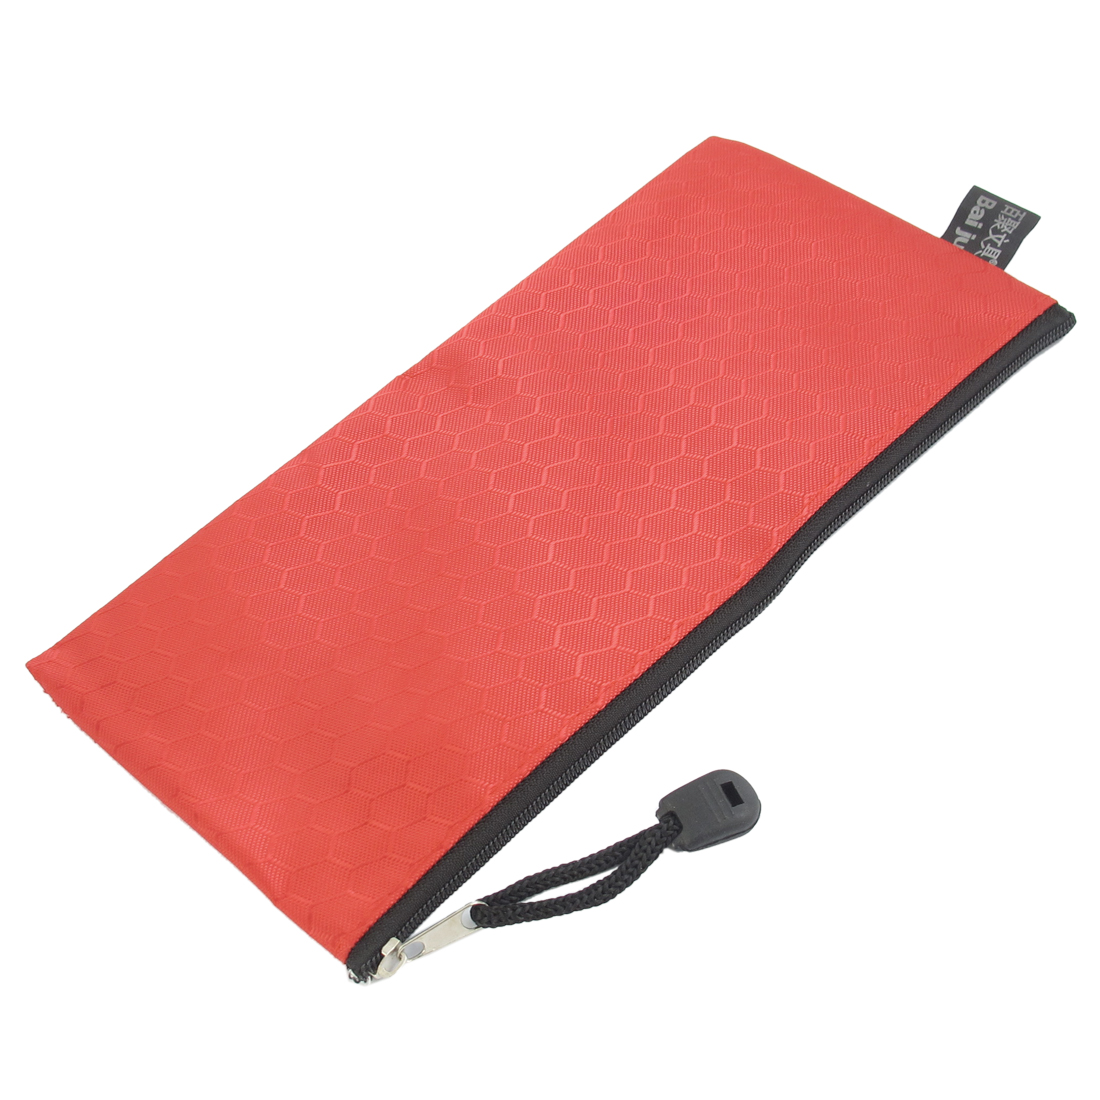 PVC Canvas Zipper Closure Hex Pattern Paper Pen Bag Holder Red